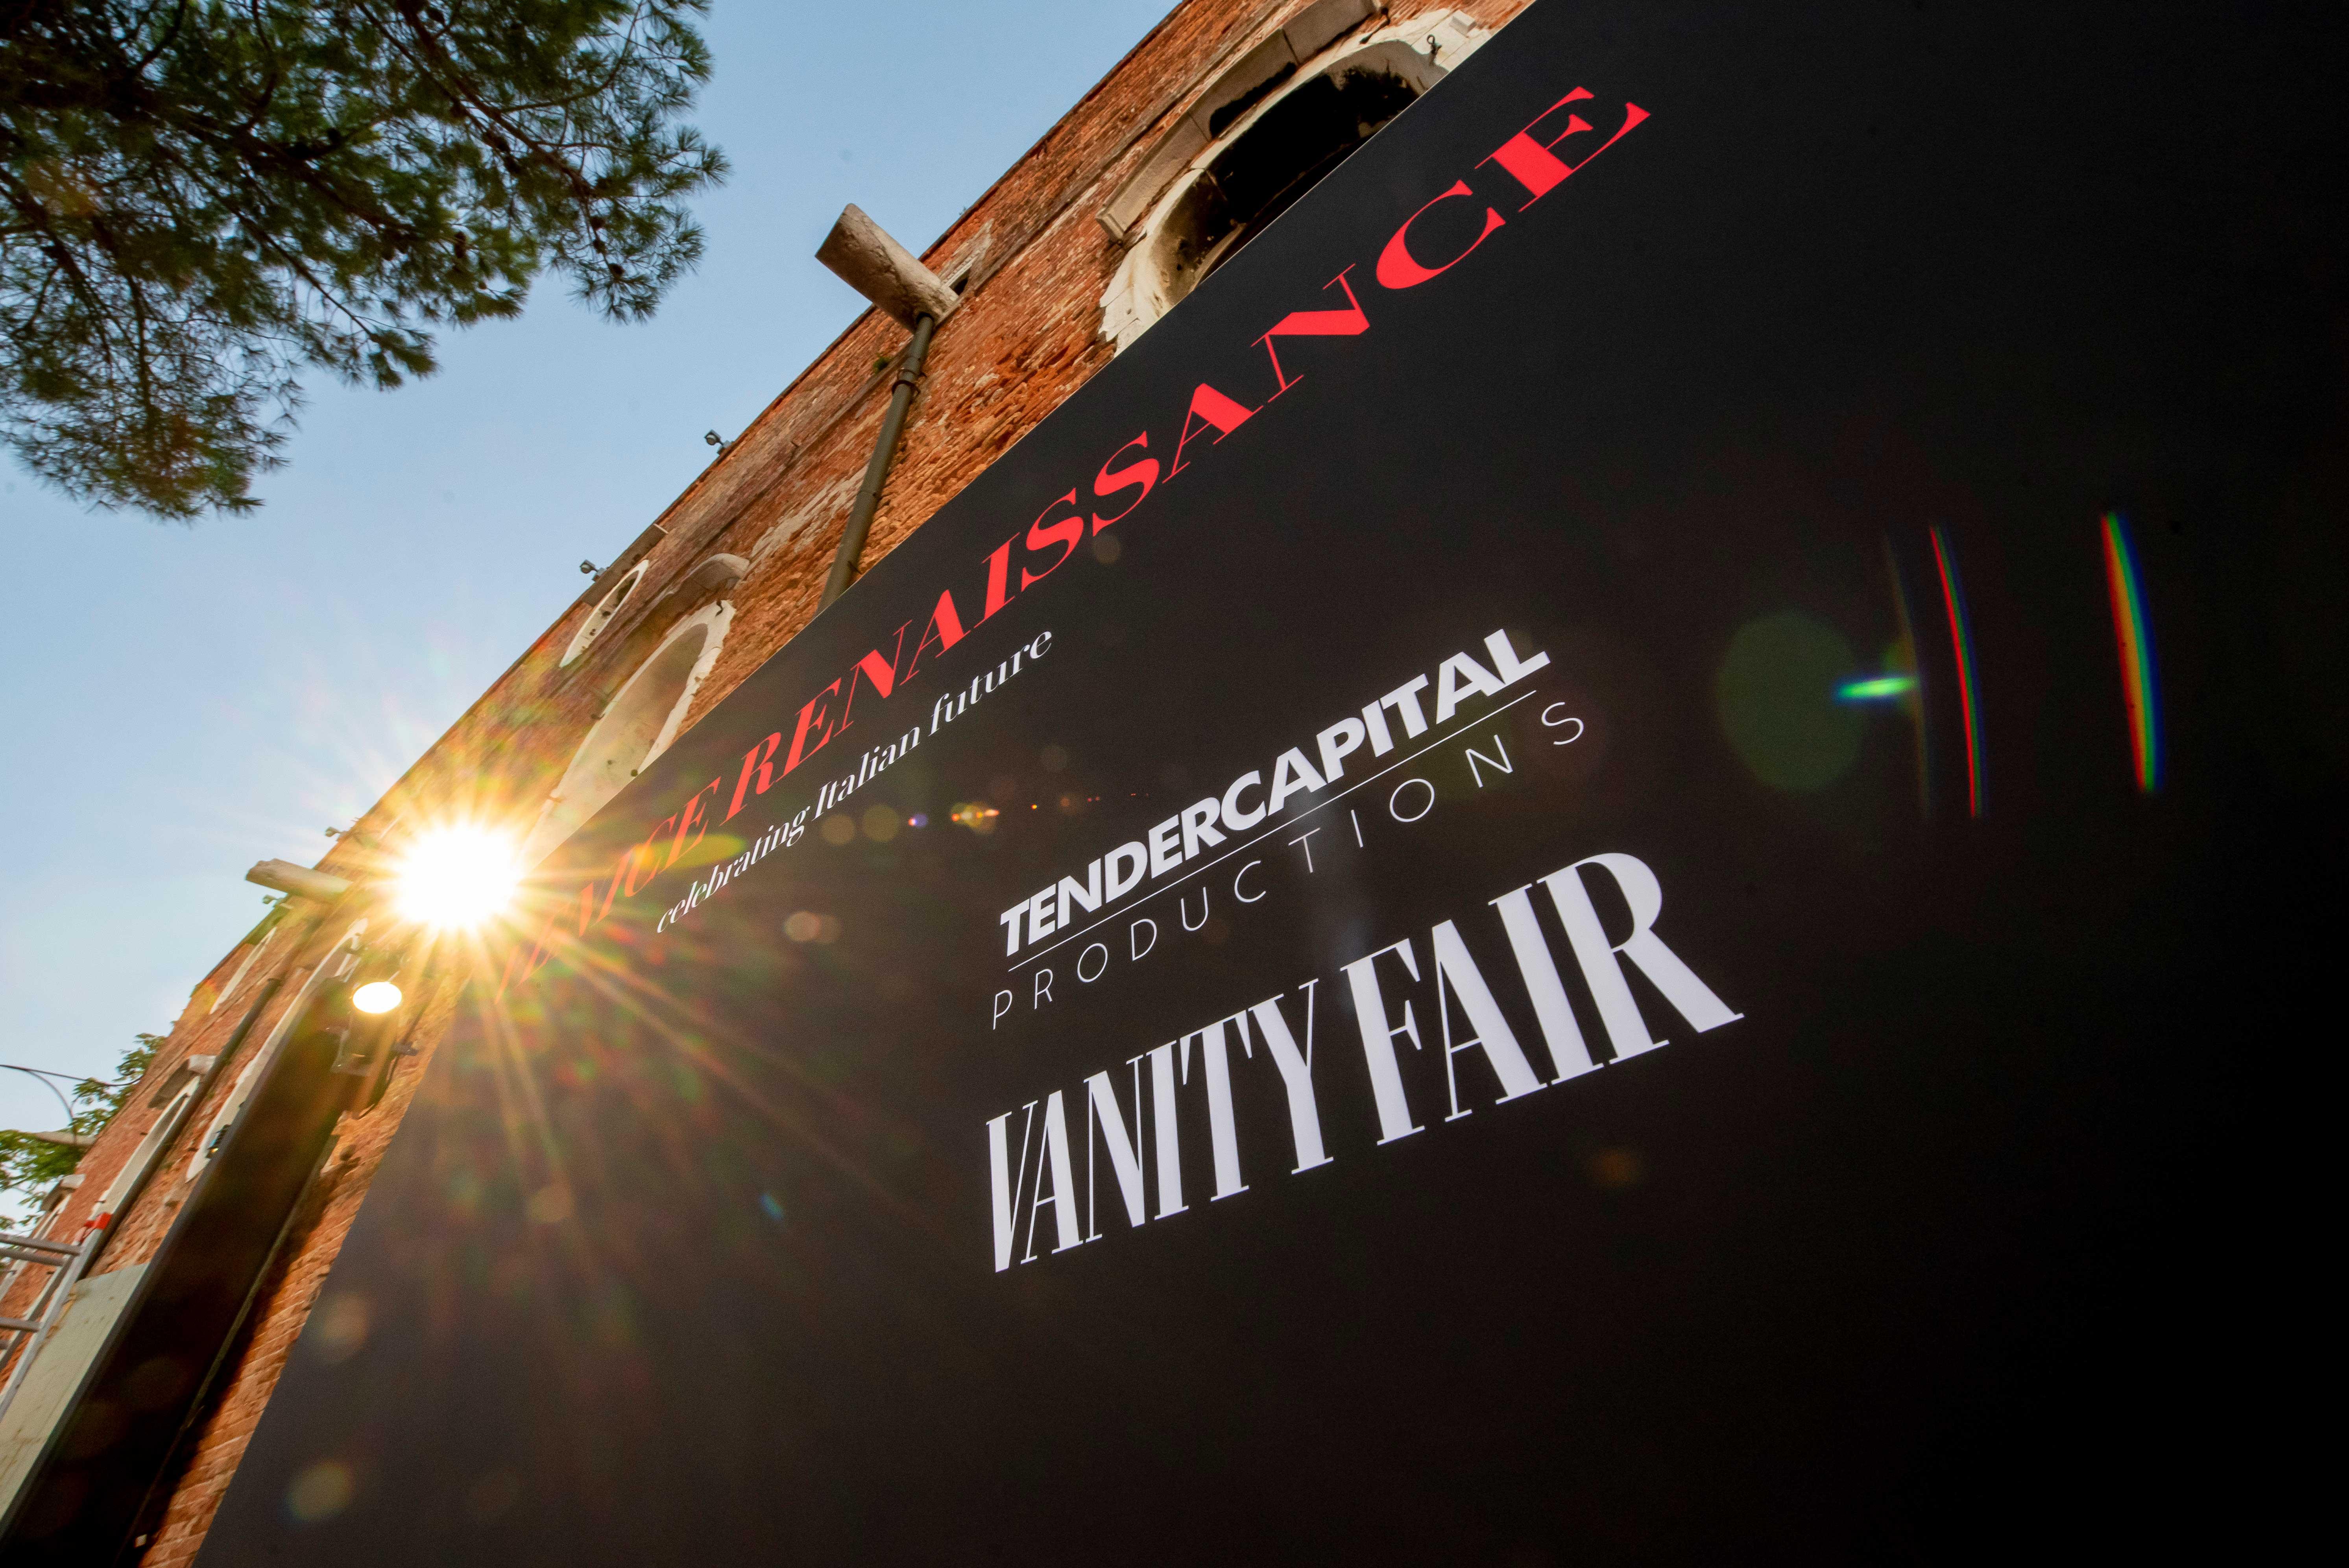 TENDERCAPITAL---Benedetta-Malavasi---Italy---Vanity-Fair-Venice-Film-Festival---Sponsor-1-small